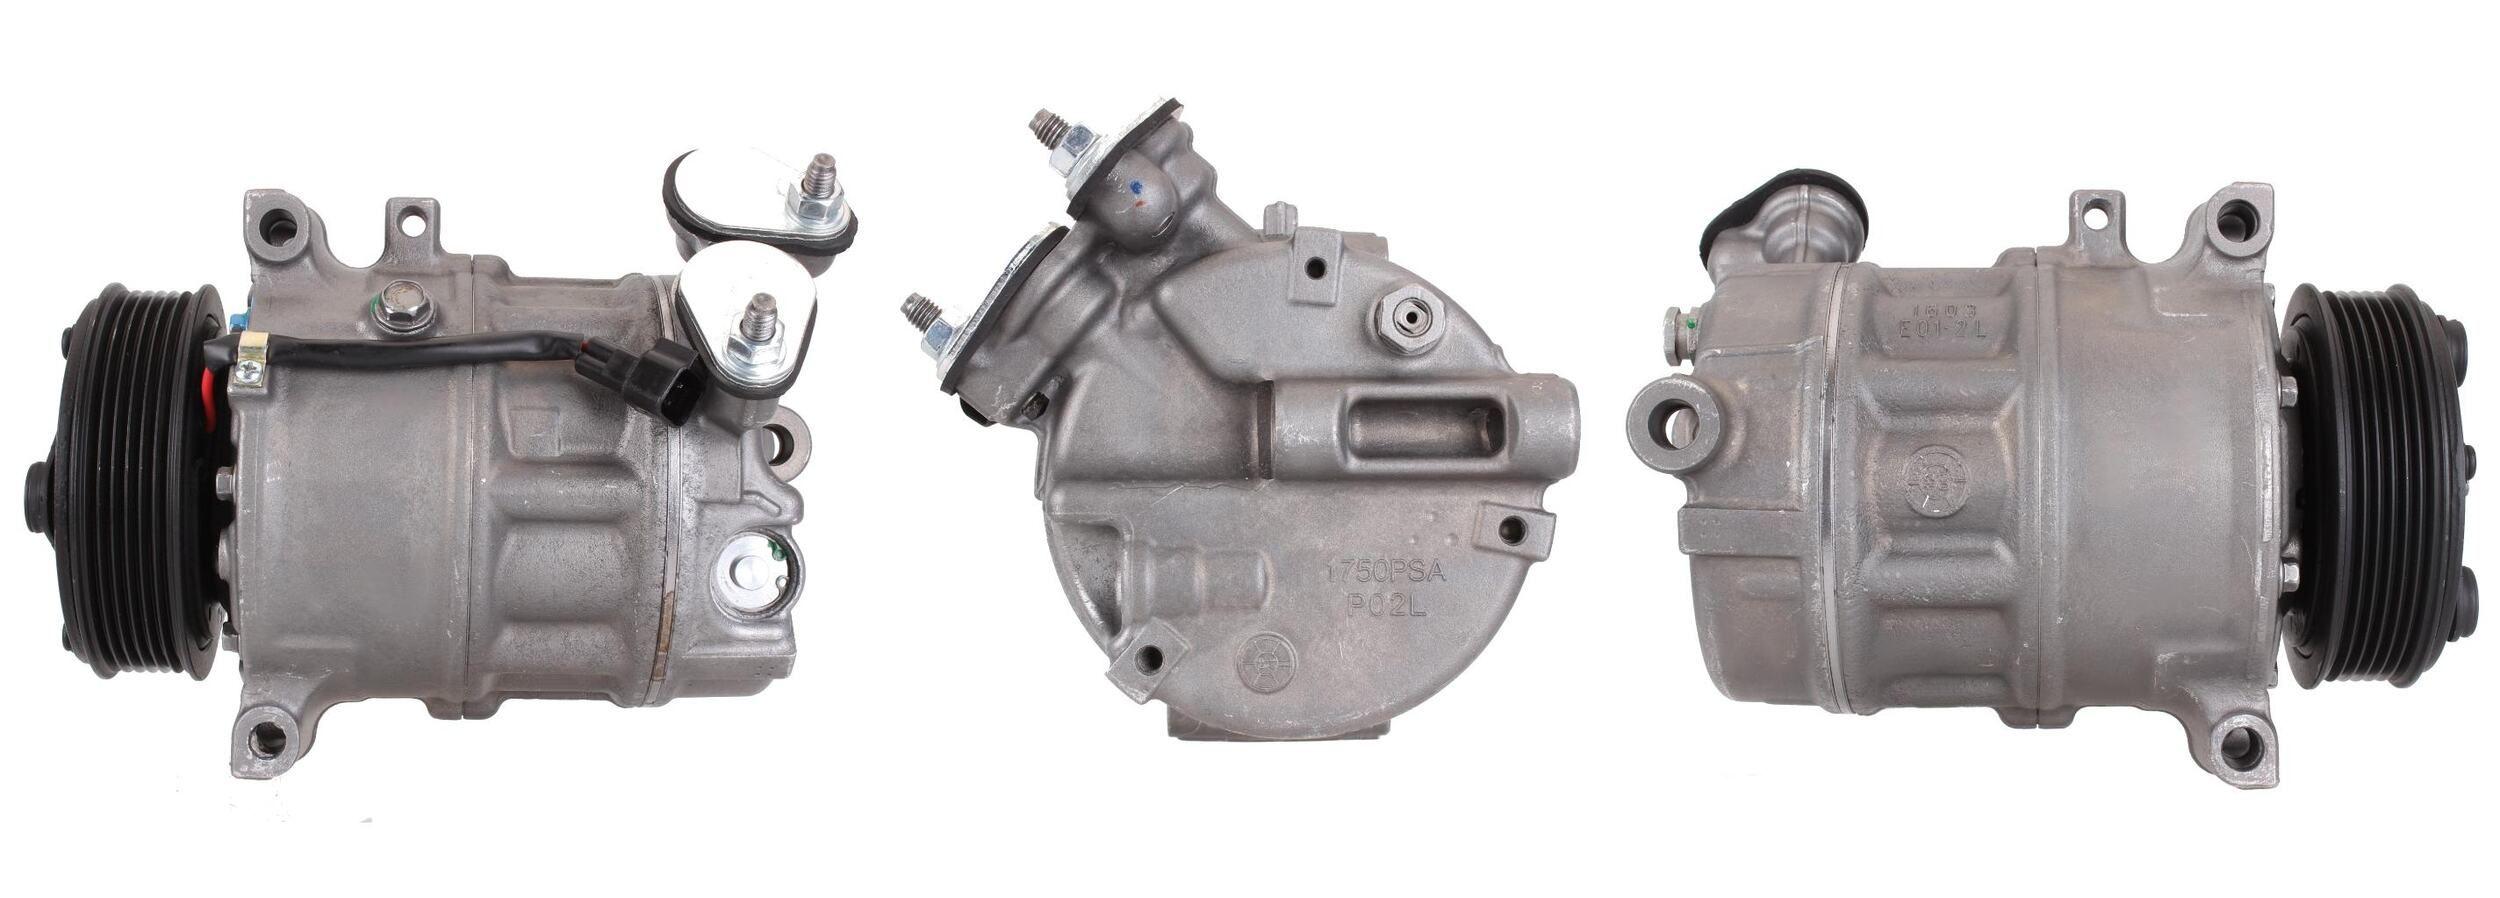 Kompressor ELSTOCK 51-0917